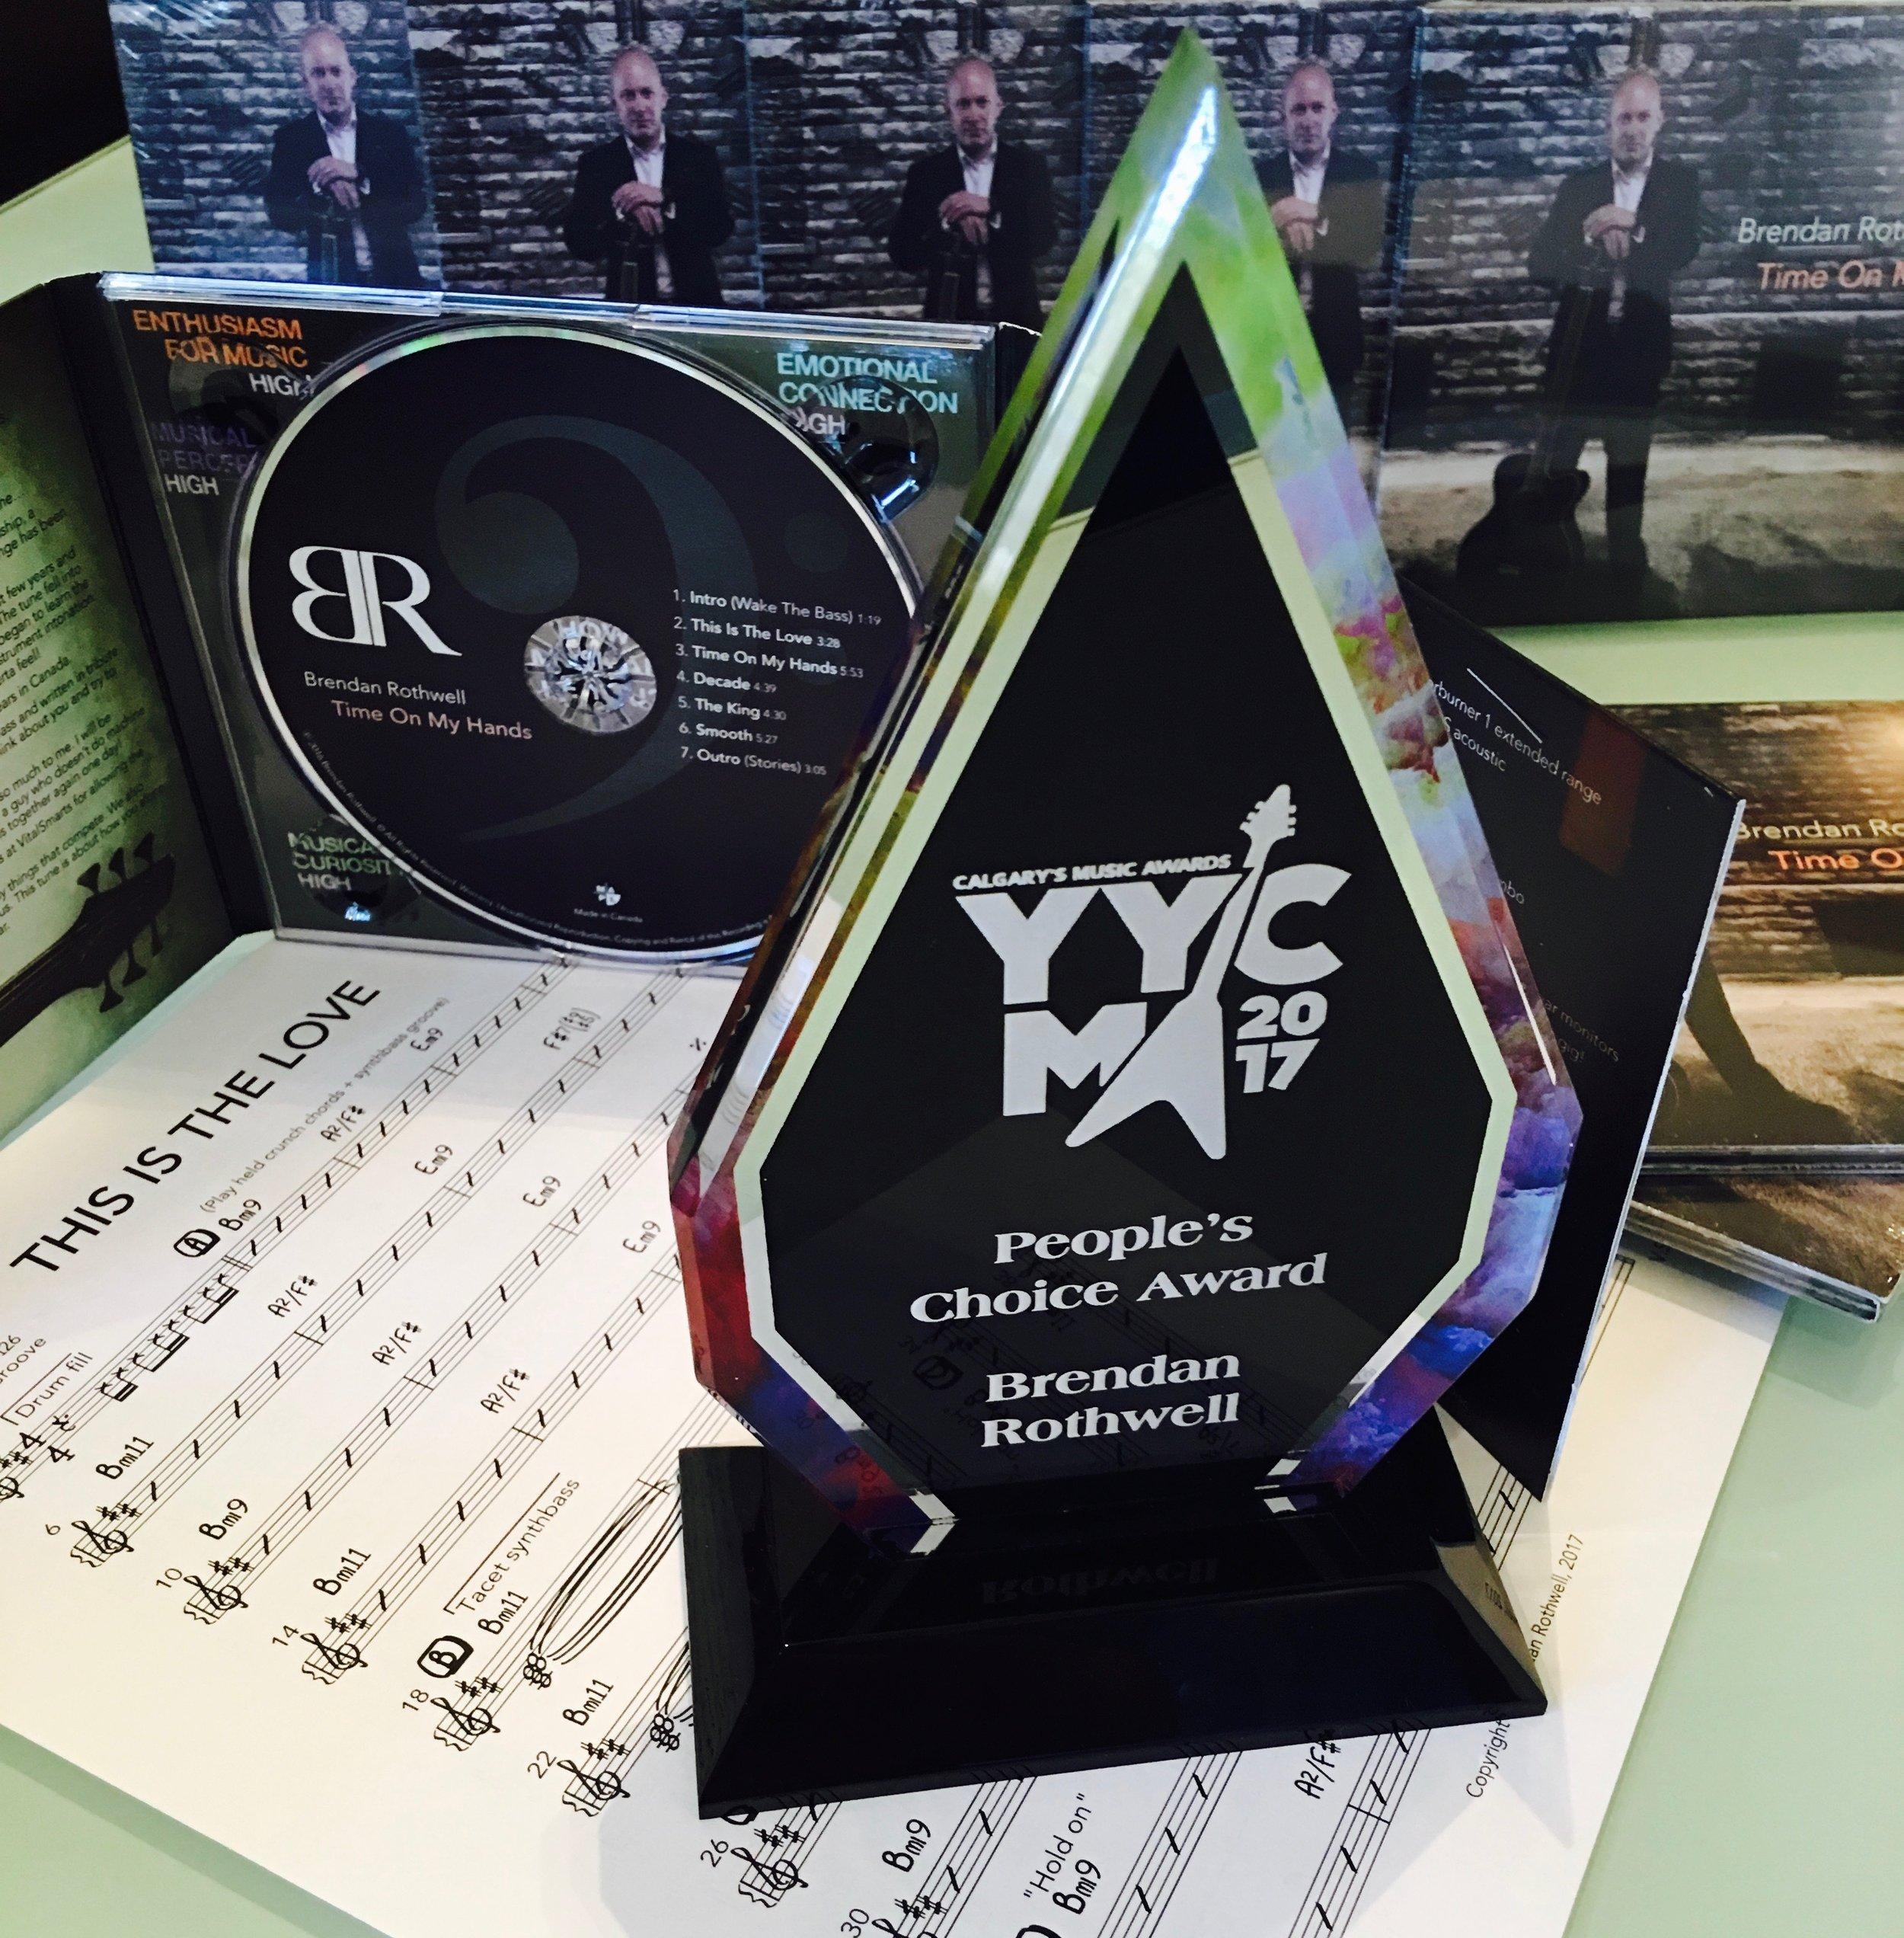 YYC Music Awards 19 09242017.jpg